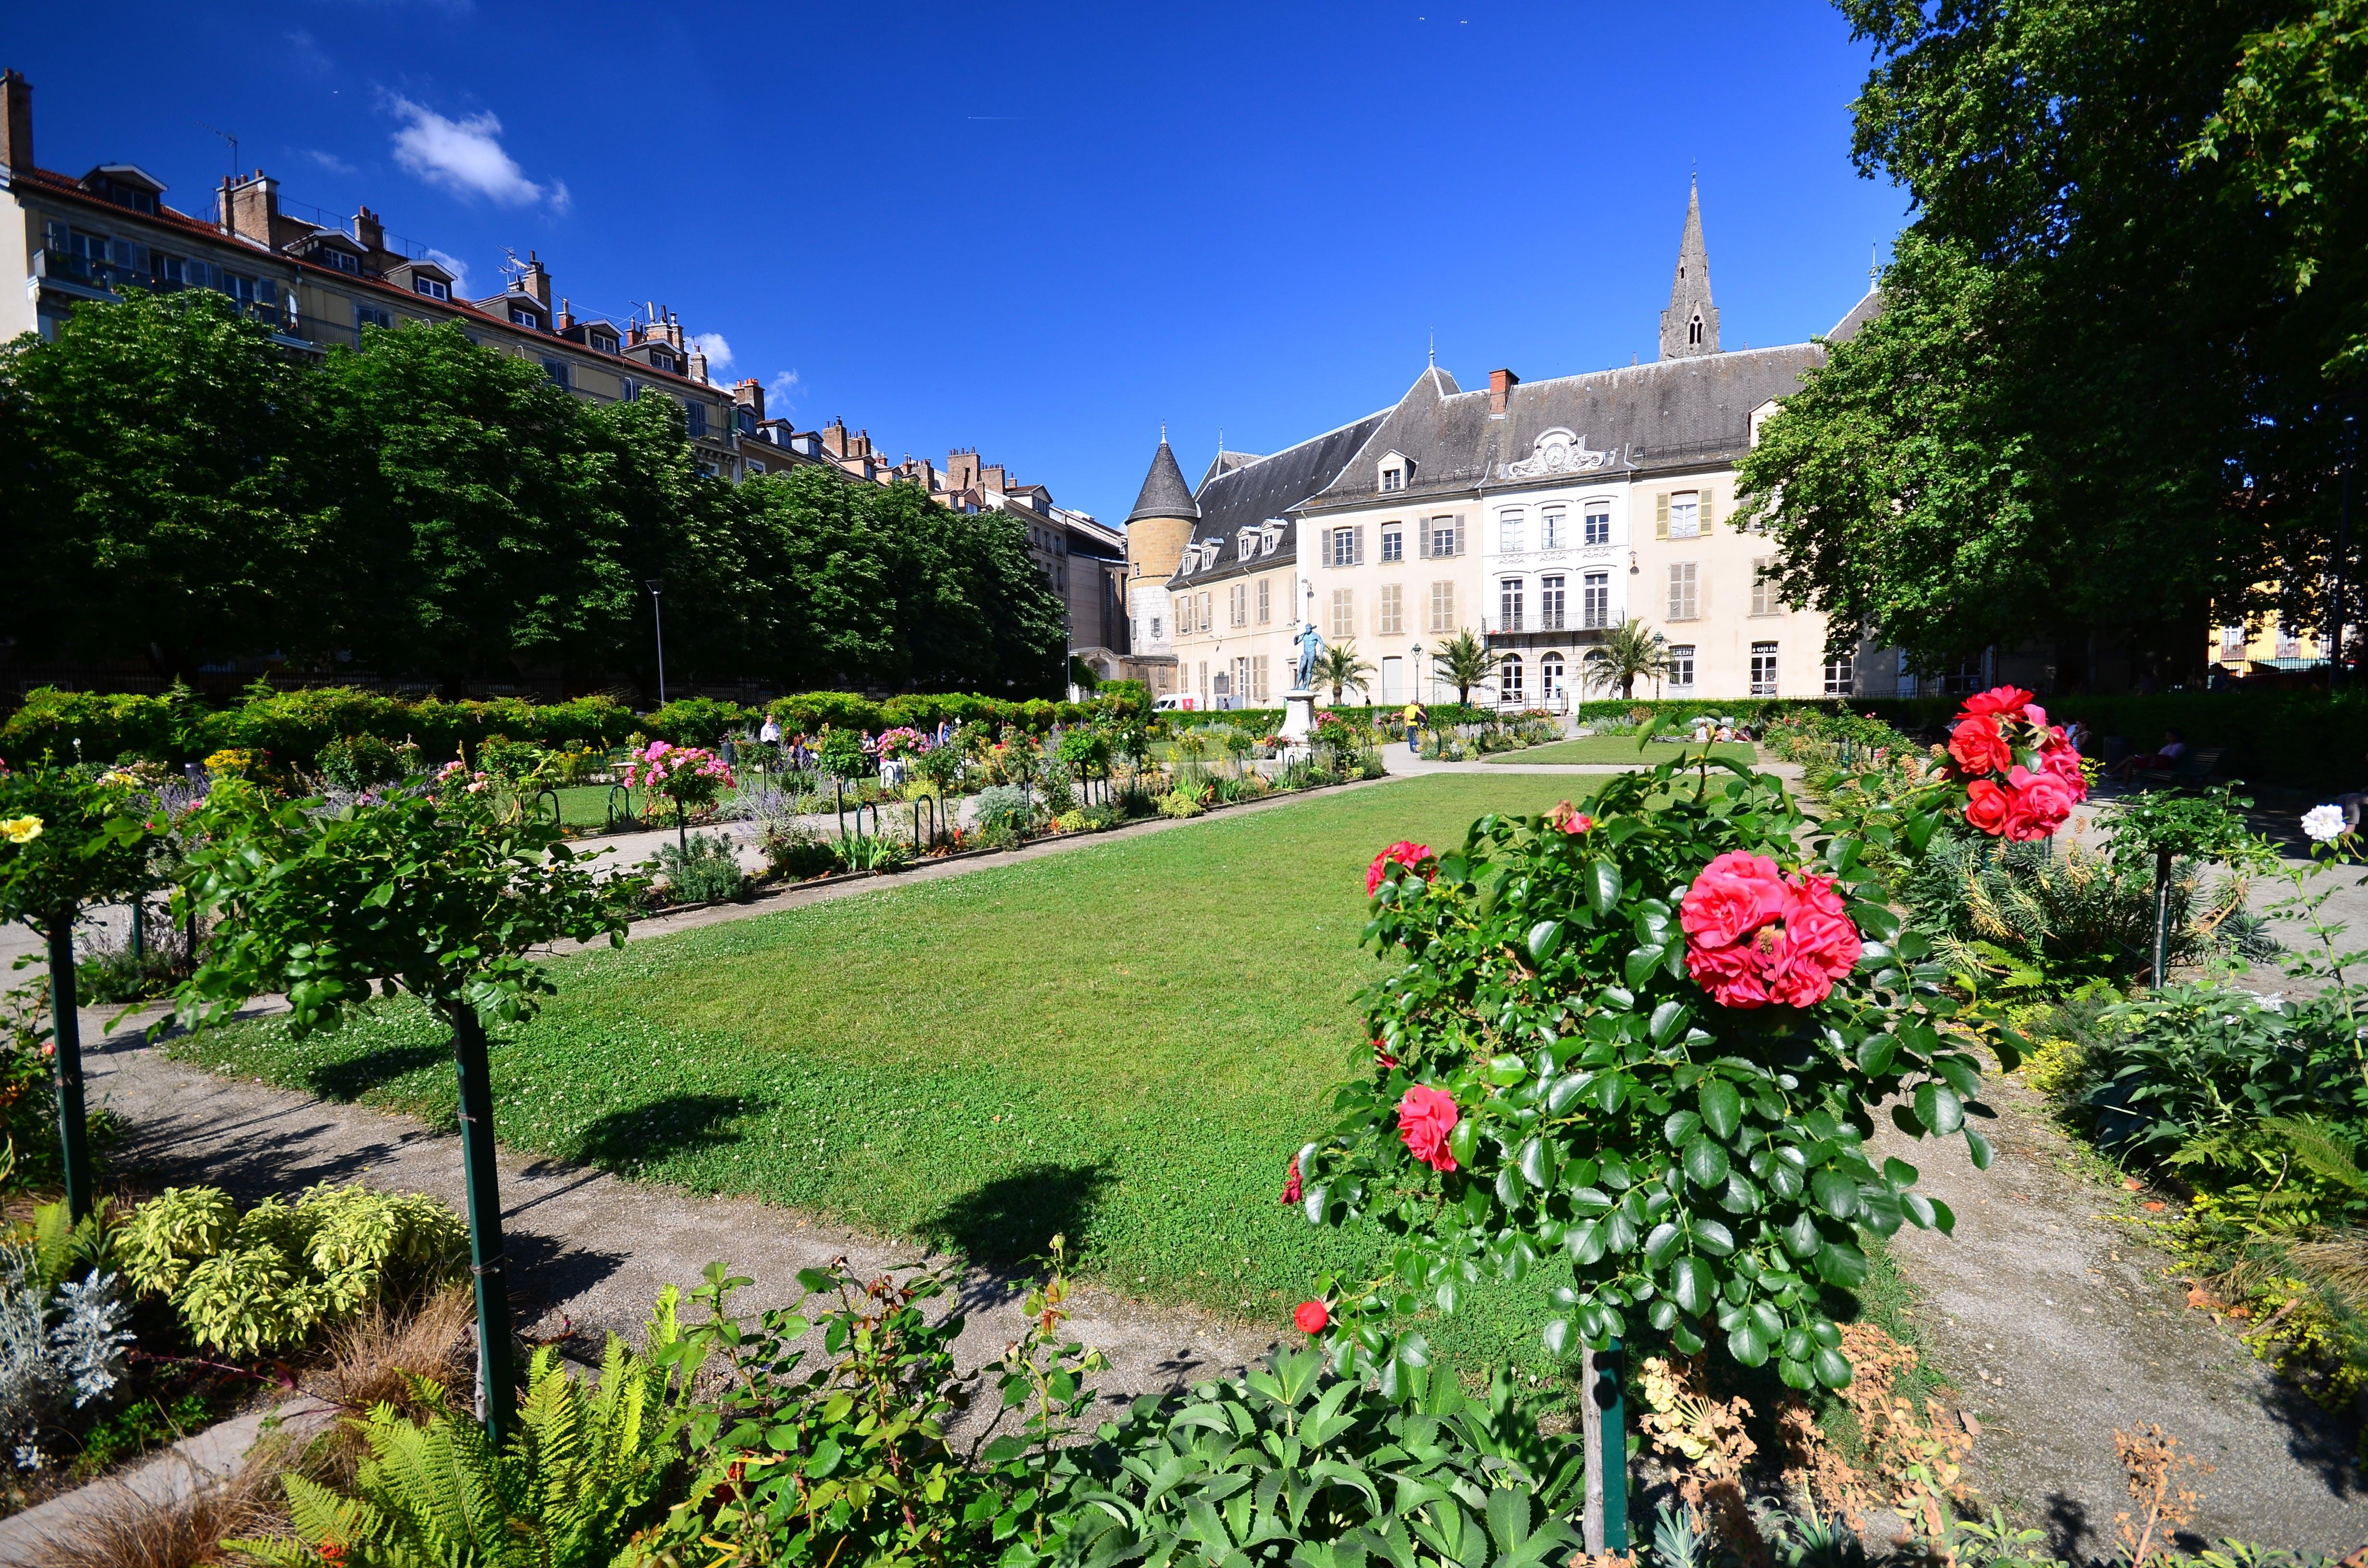 Jardin de ville shooting photo, shooting photo mariage, photographe mariage, photographe Grenoble, shooting photo Grenoble